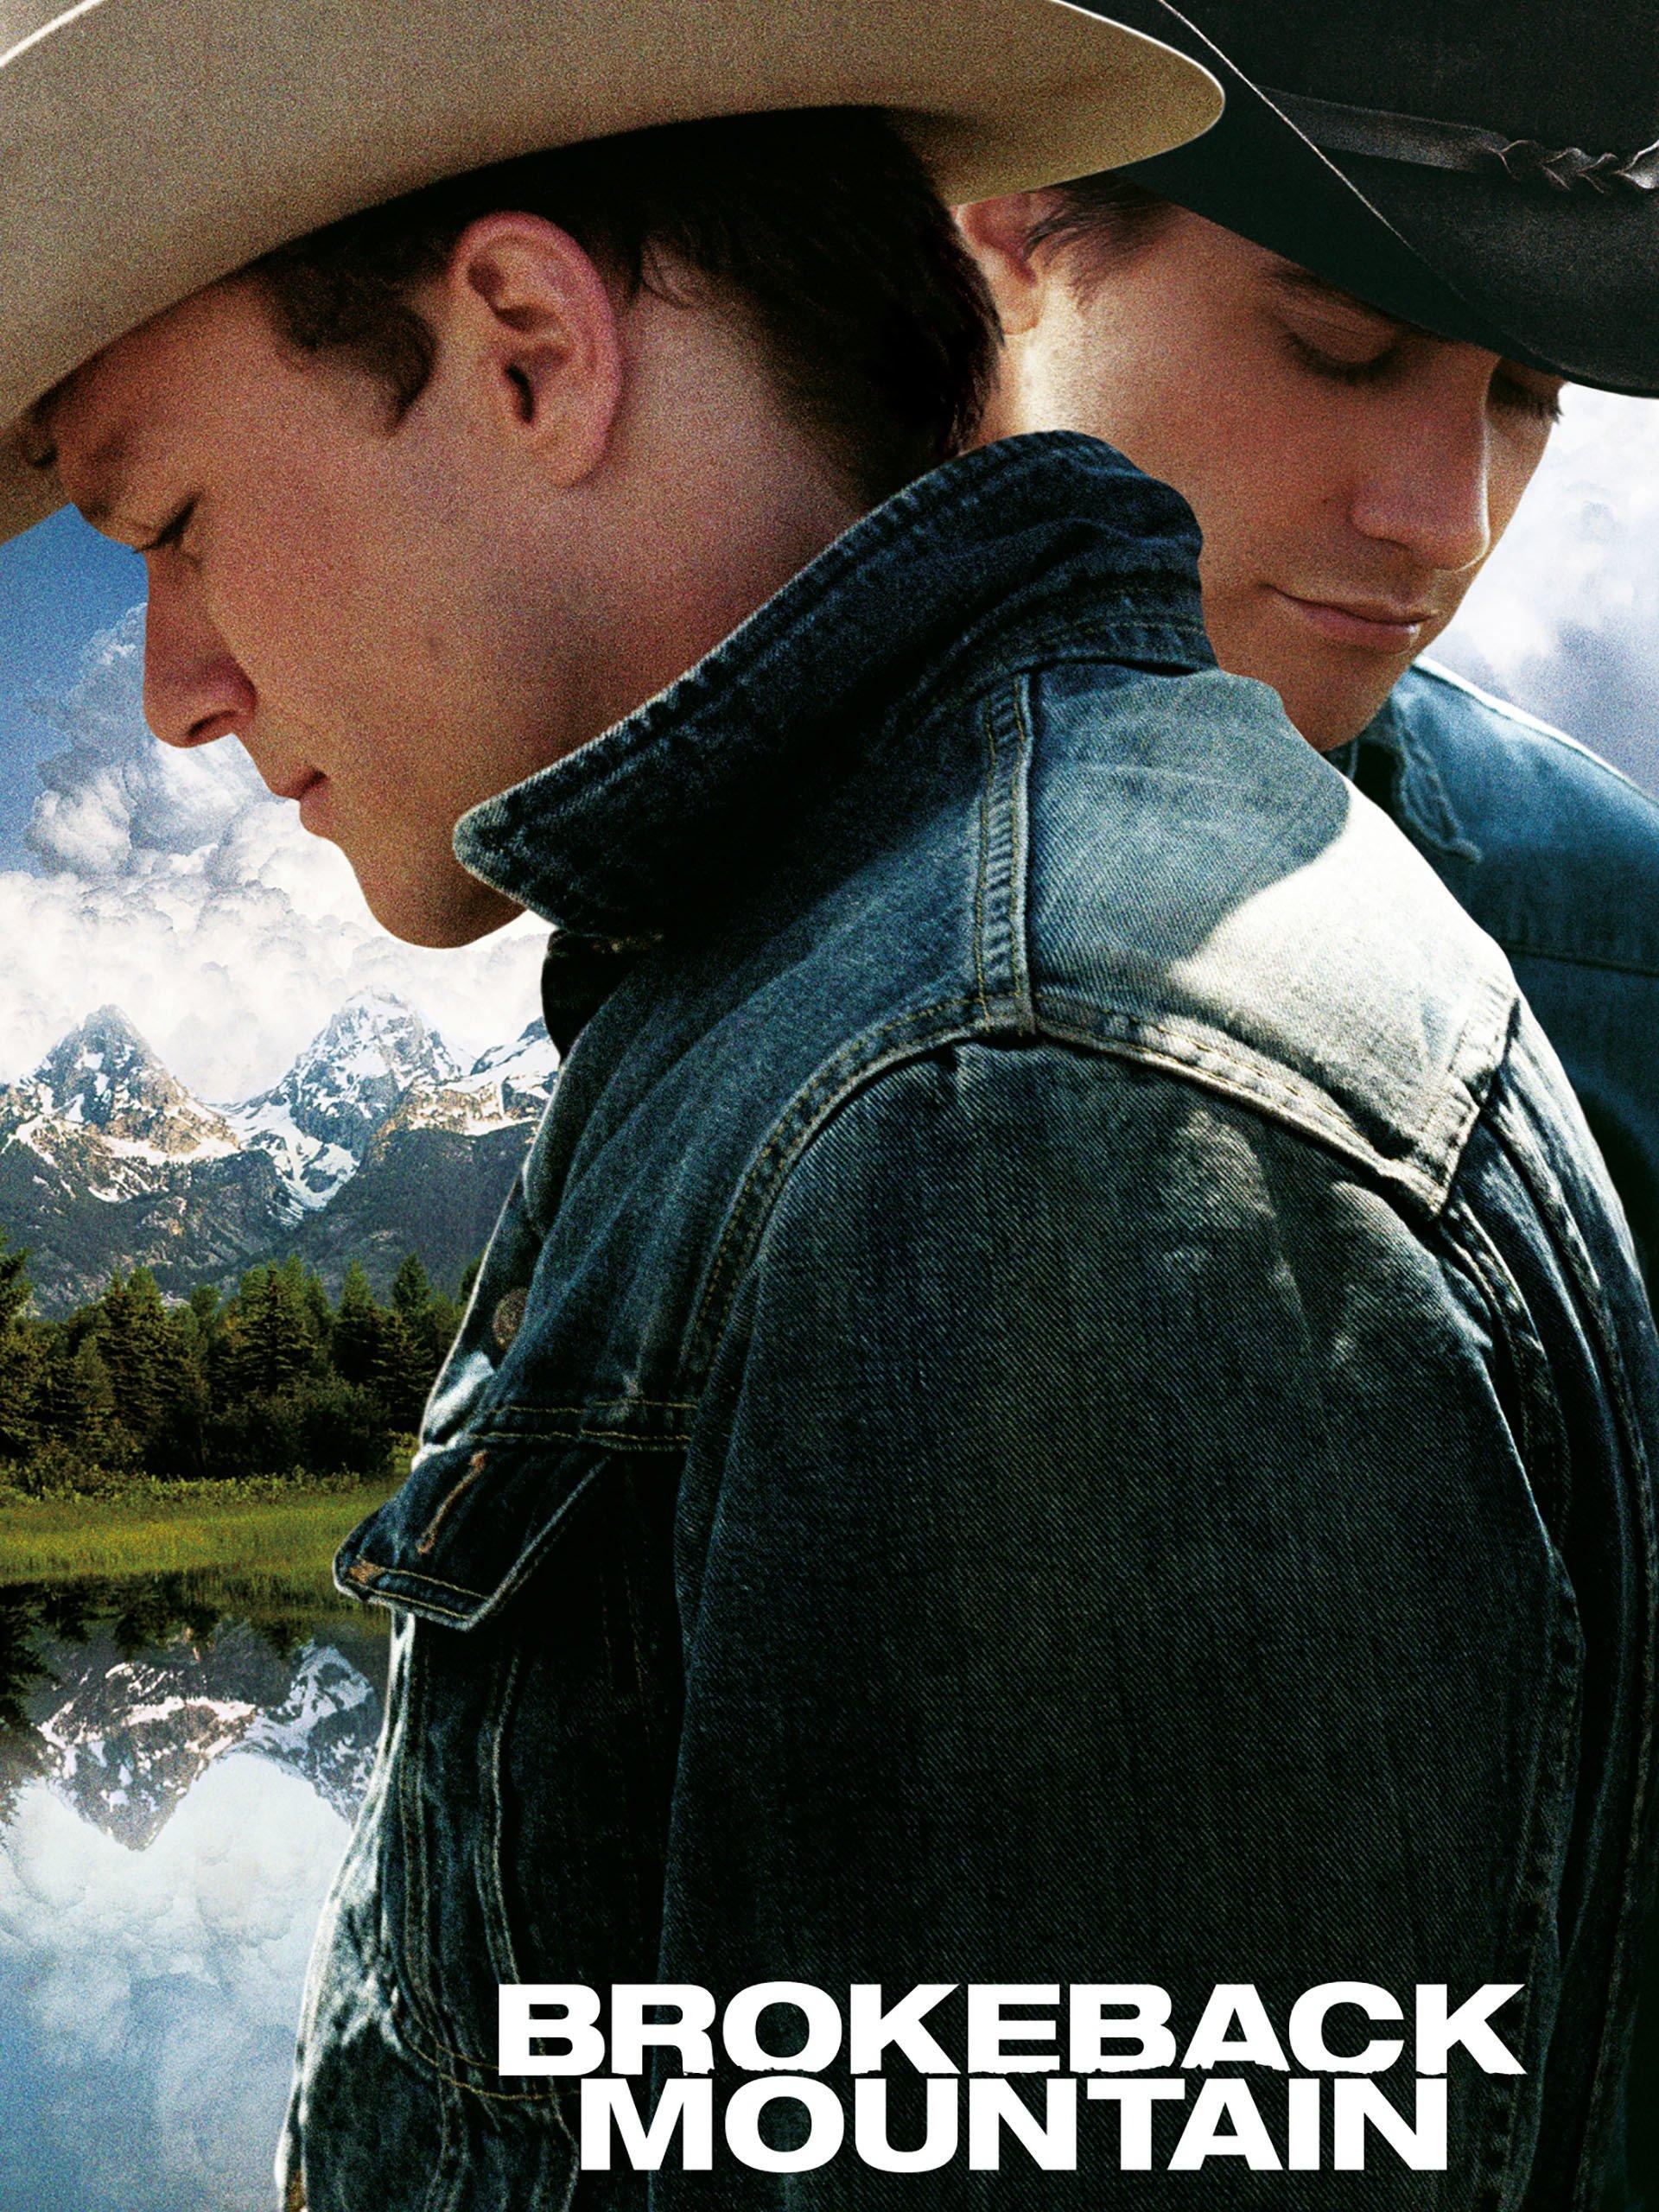 Brokeback mountain gay methodolgy pic 902